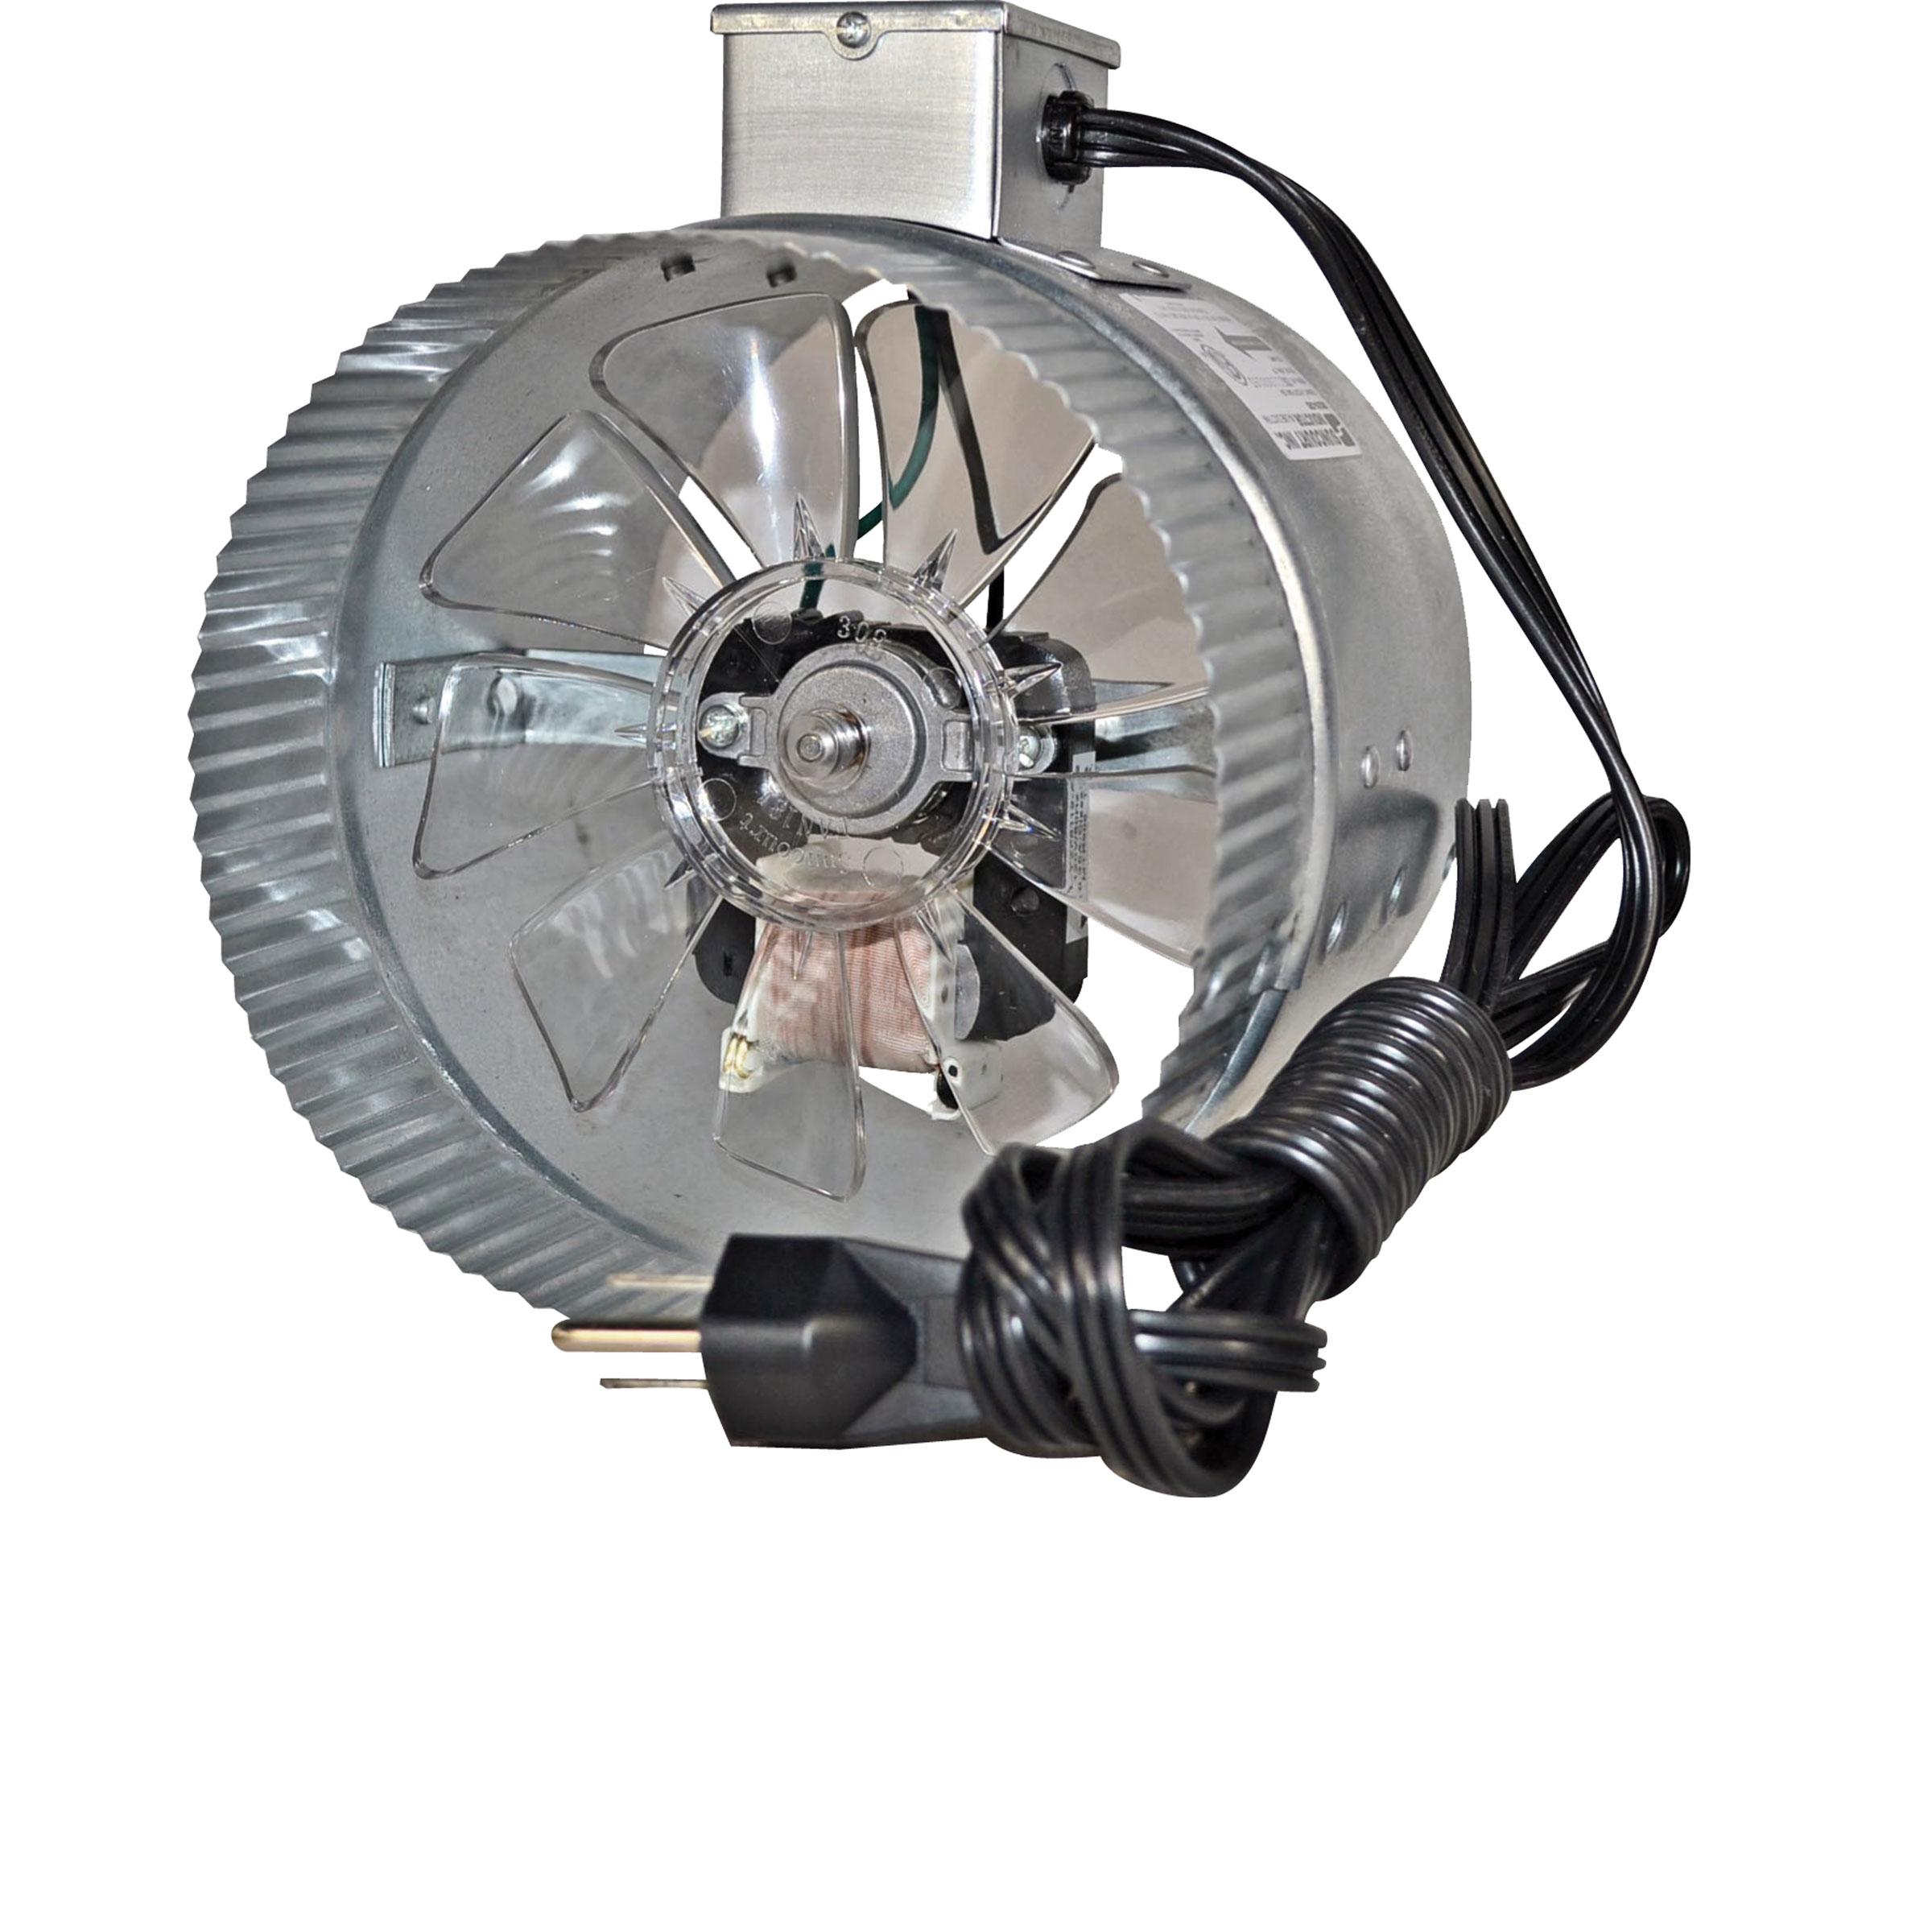 wiring a xpelair fan 2008 gmc savana radio diagram duct library